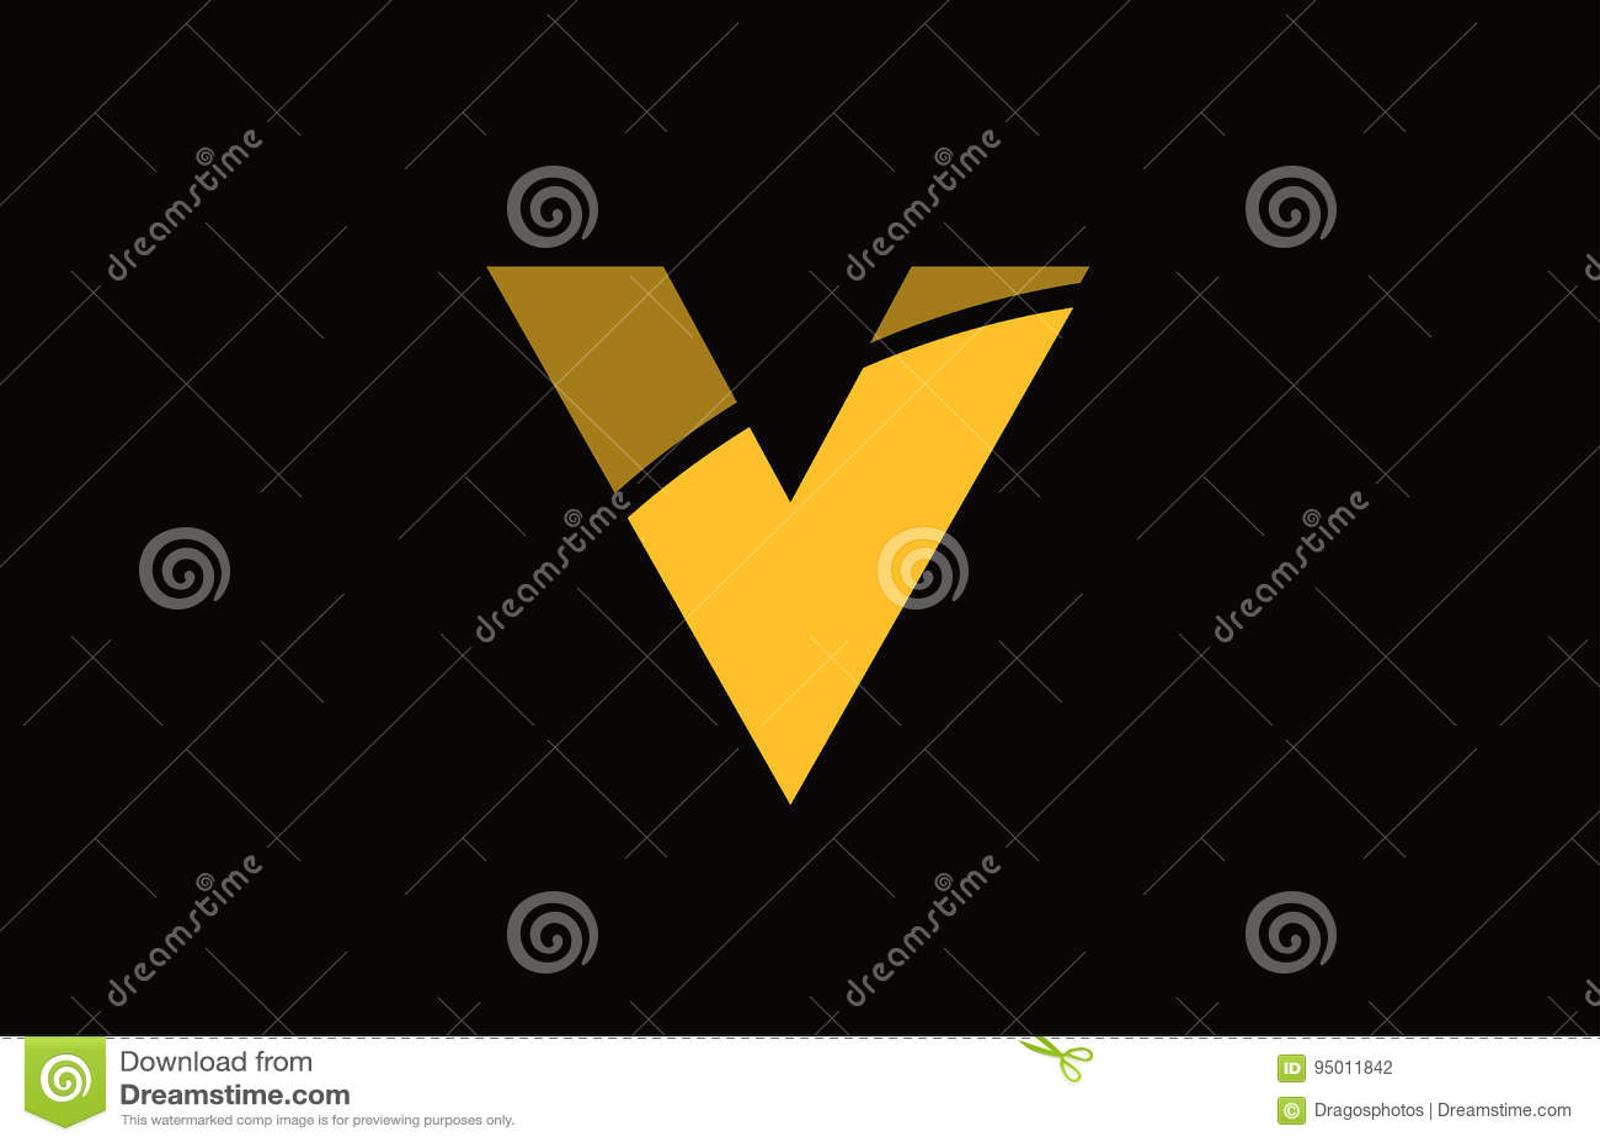 v alphabet yellow letter logo icon template company